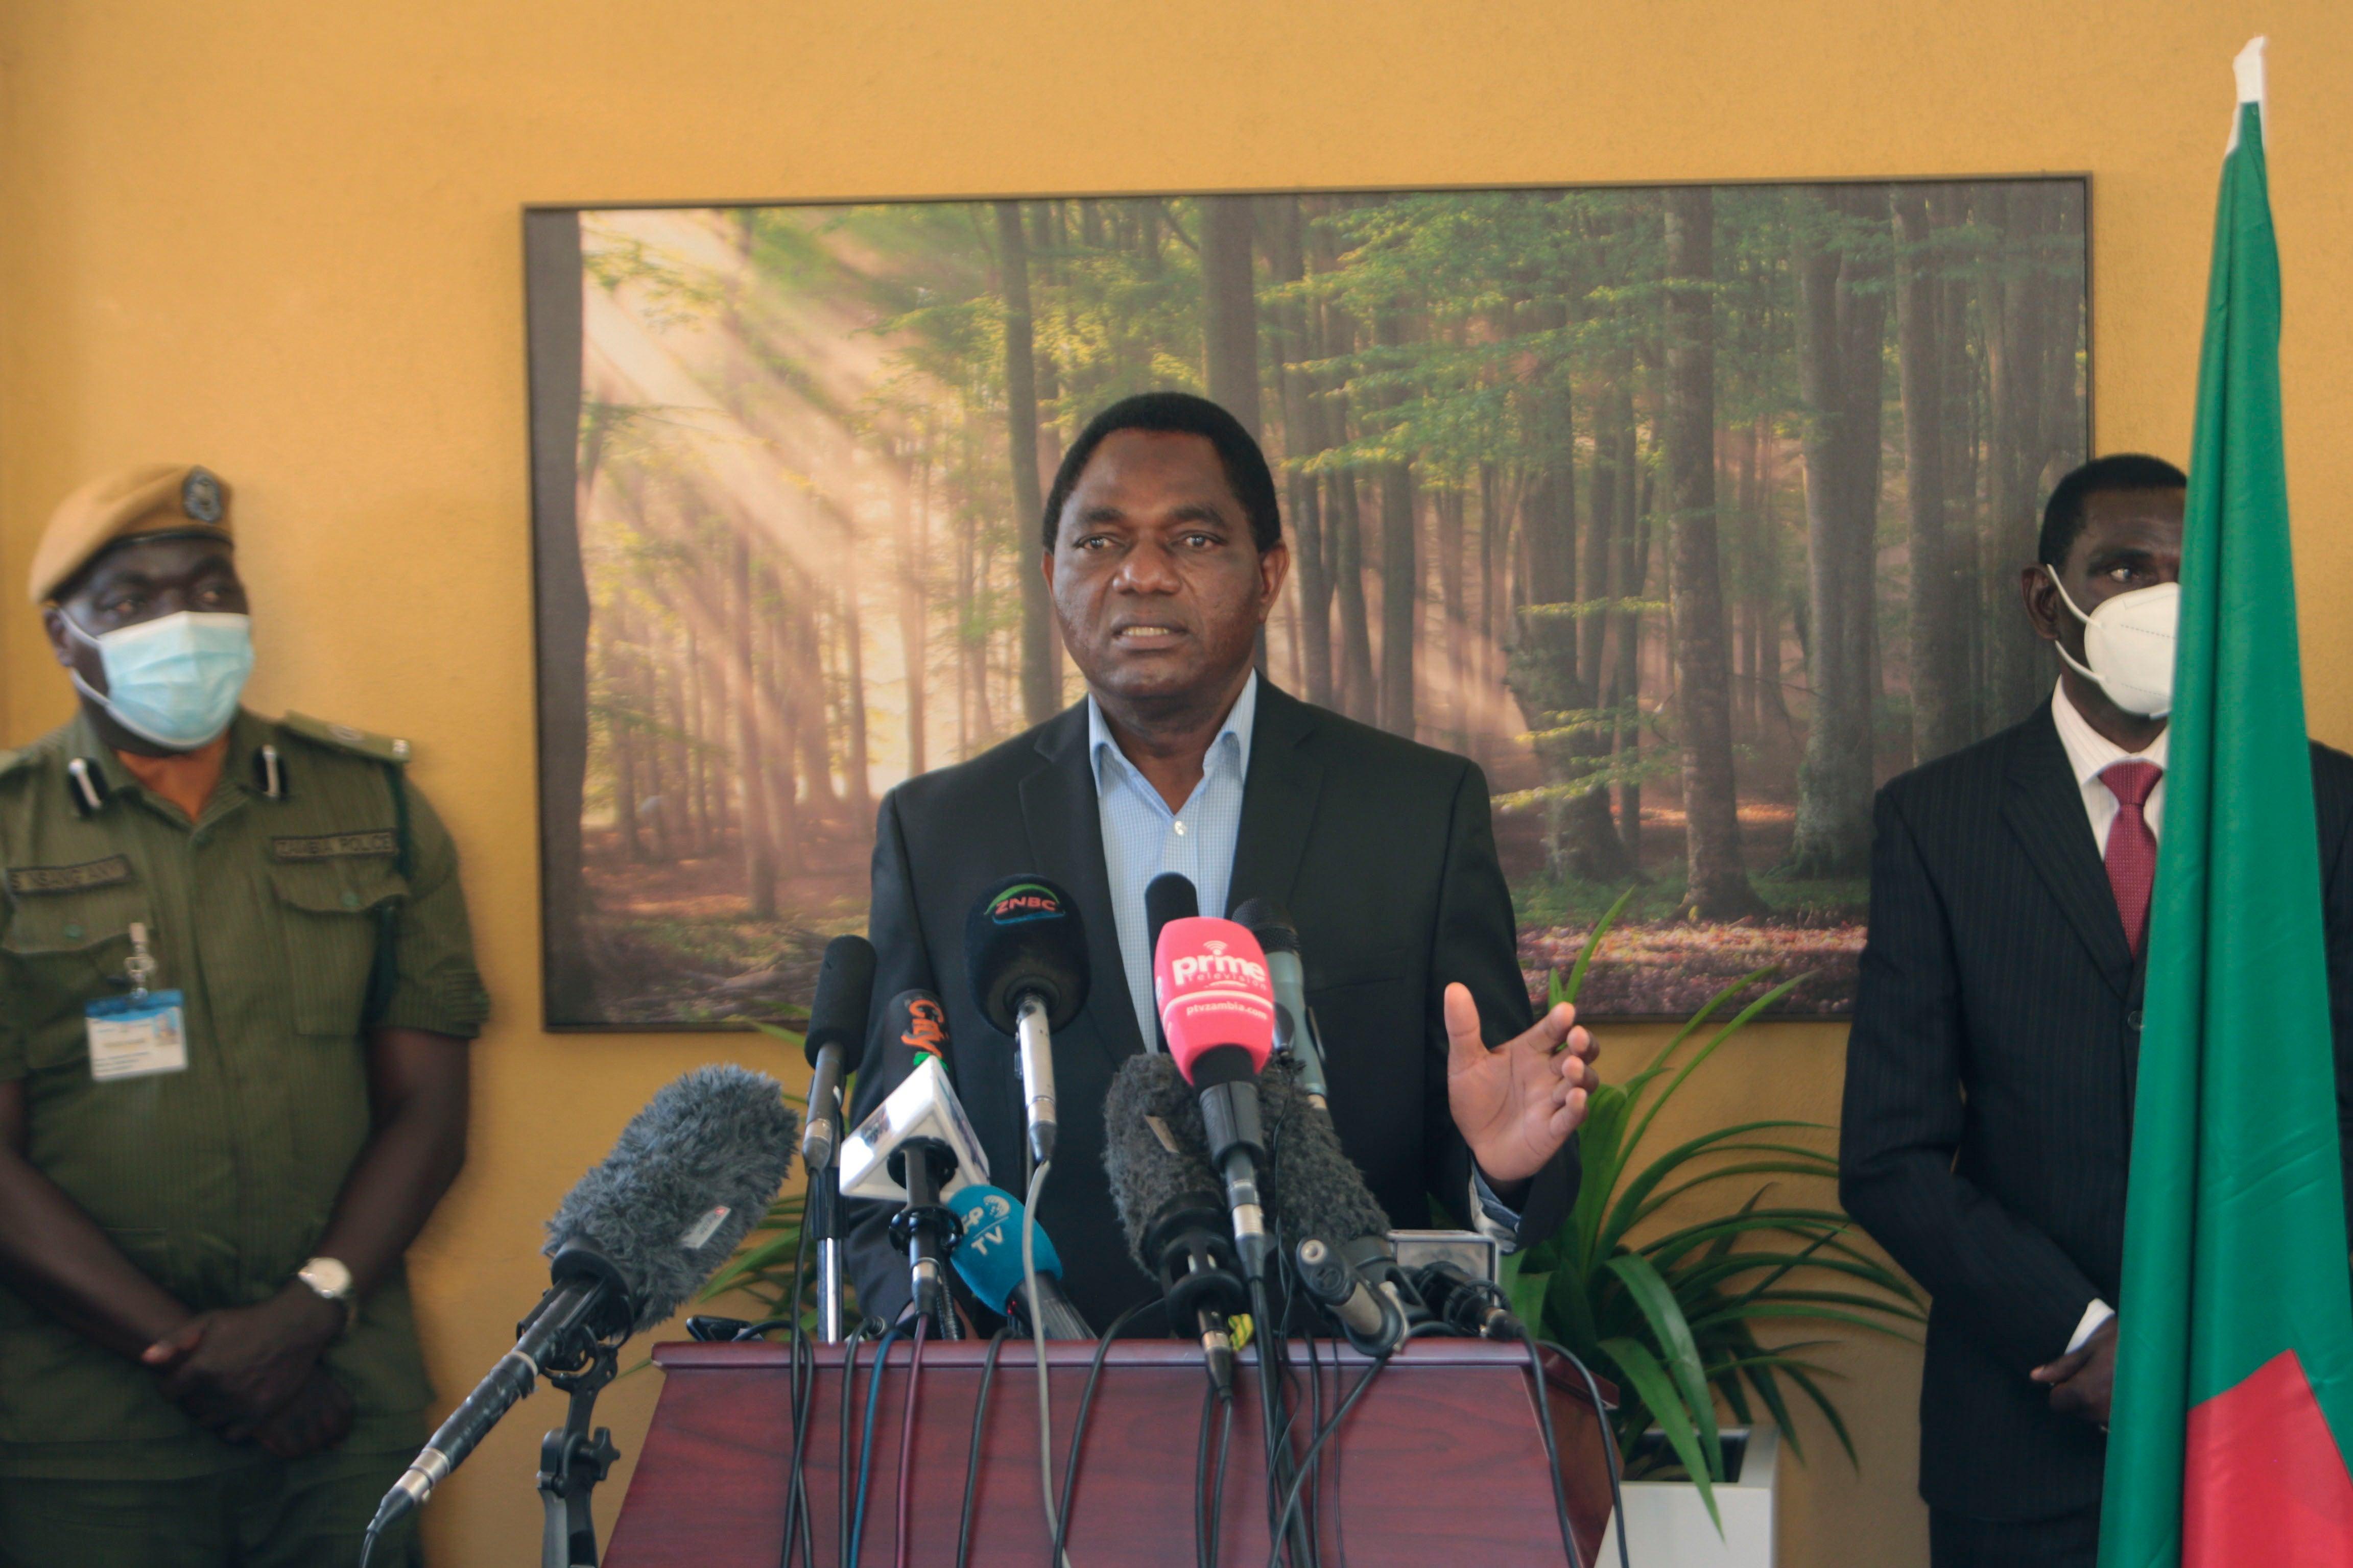 Zambia's Peaceful Transition 'a New Dawn?'